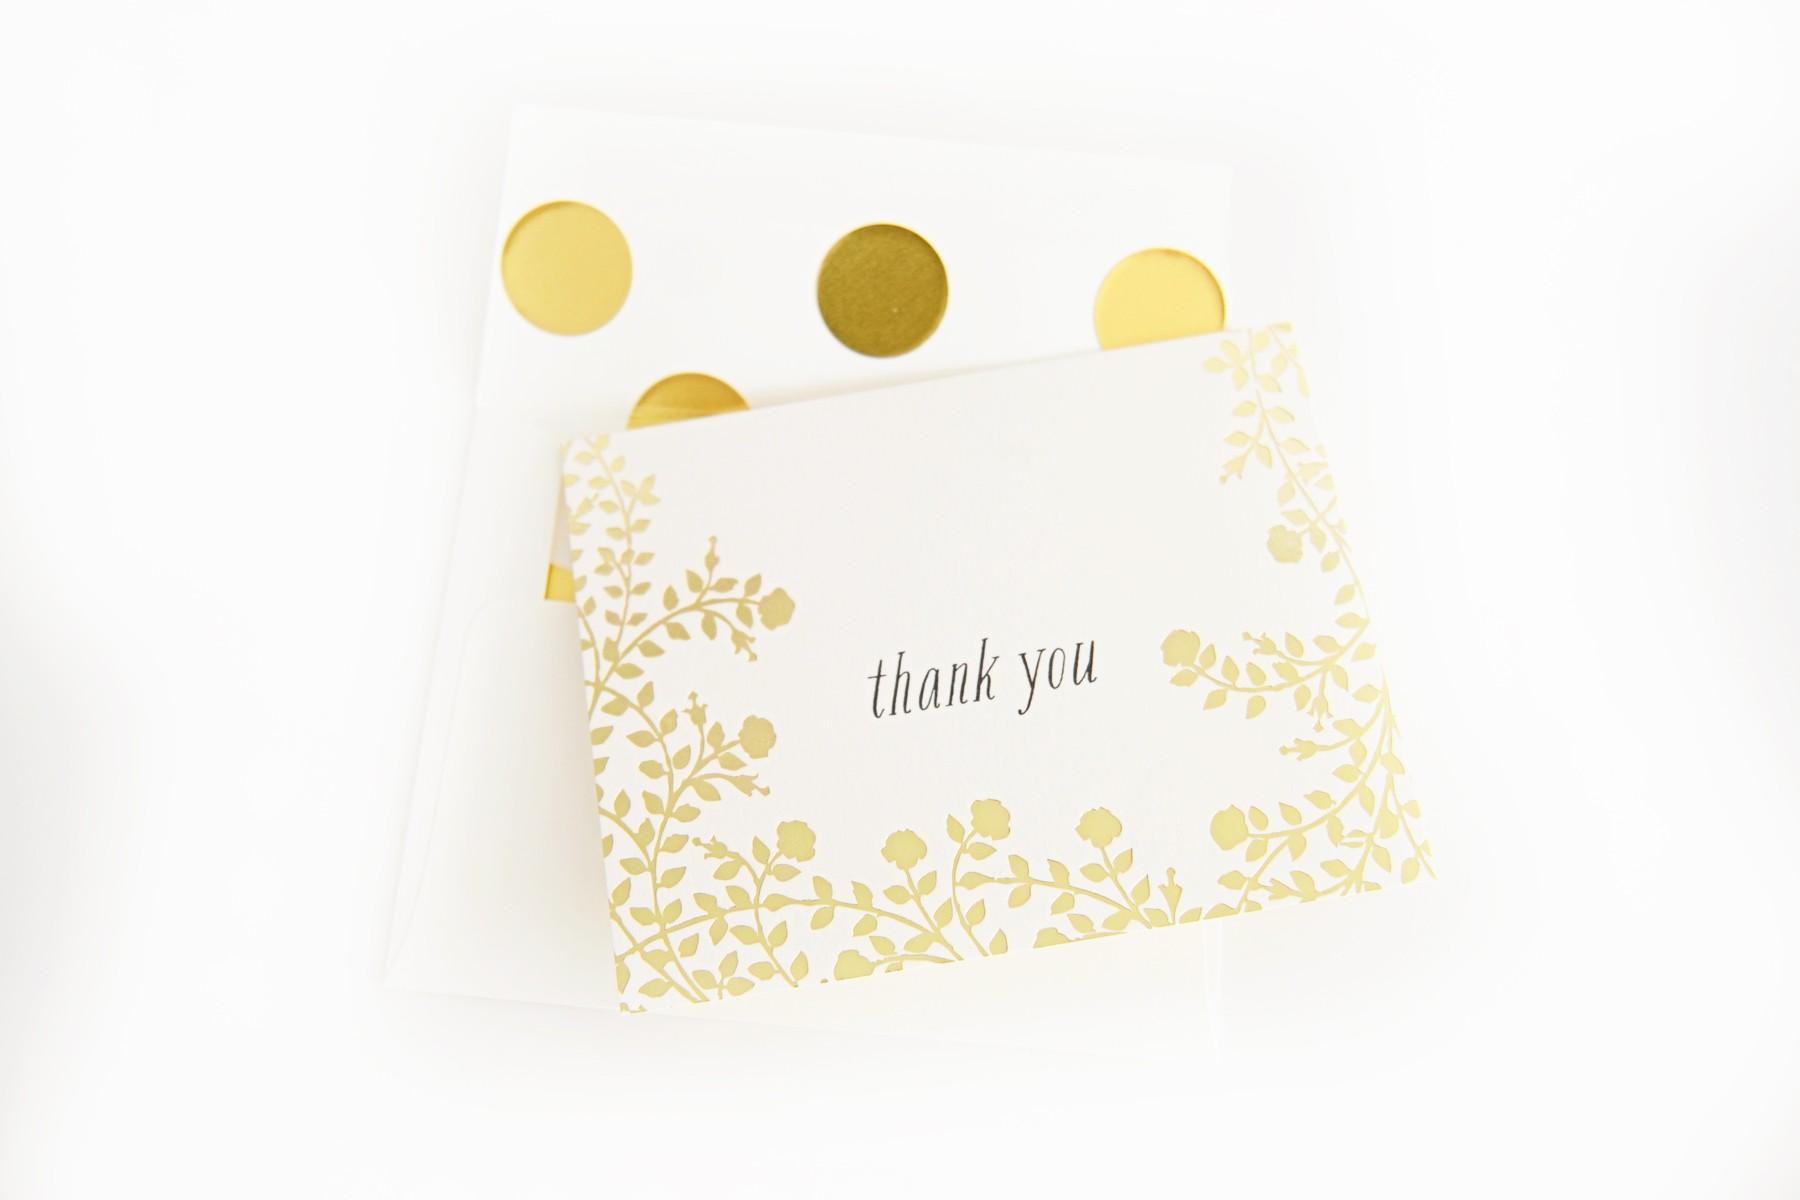 DIY Lined Envelopes with Gold Polka Dots